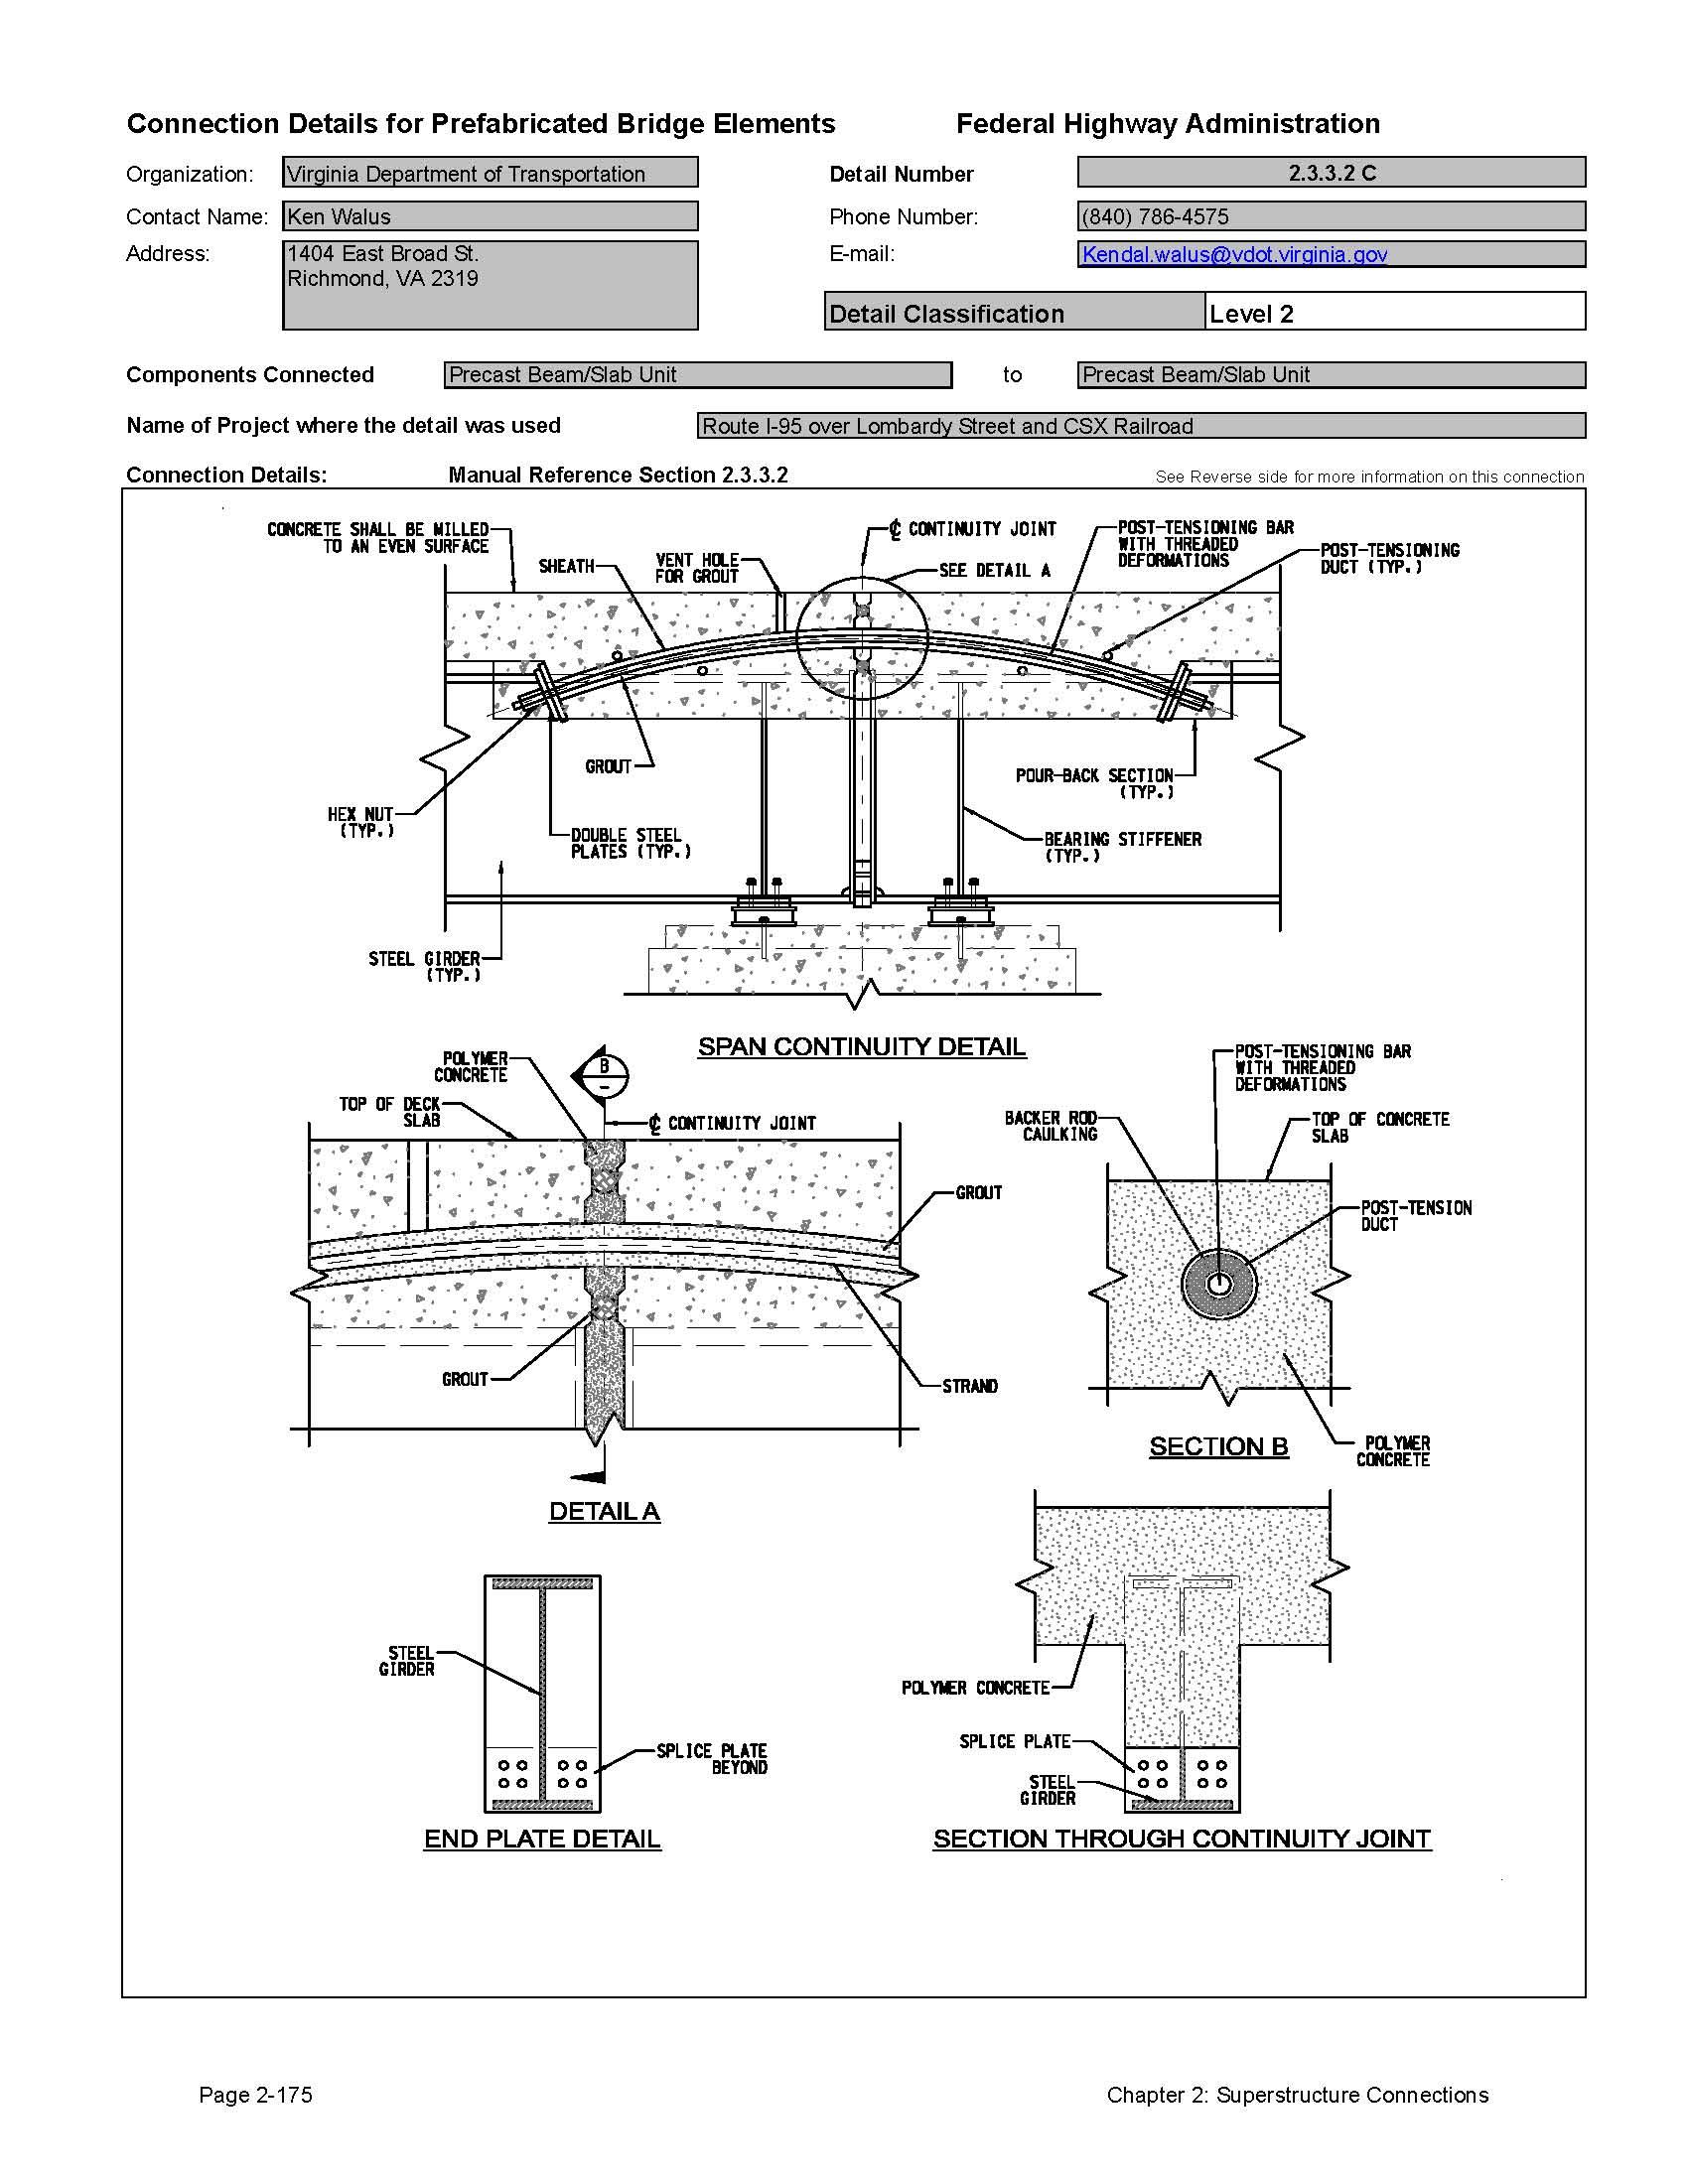 Precast beam slab unit and precast beam slab unit the detail